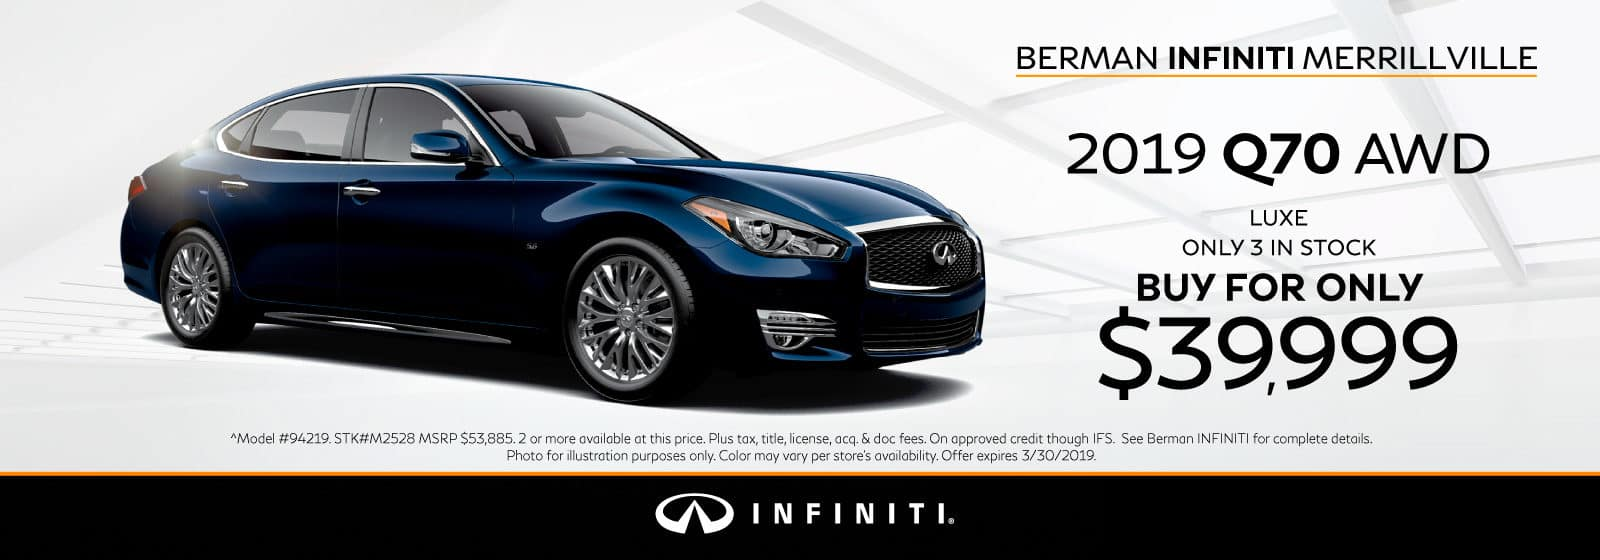 New 2019 INFINITI Q70 March Offer at Berman INFINITI of Merrillville!